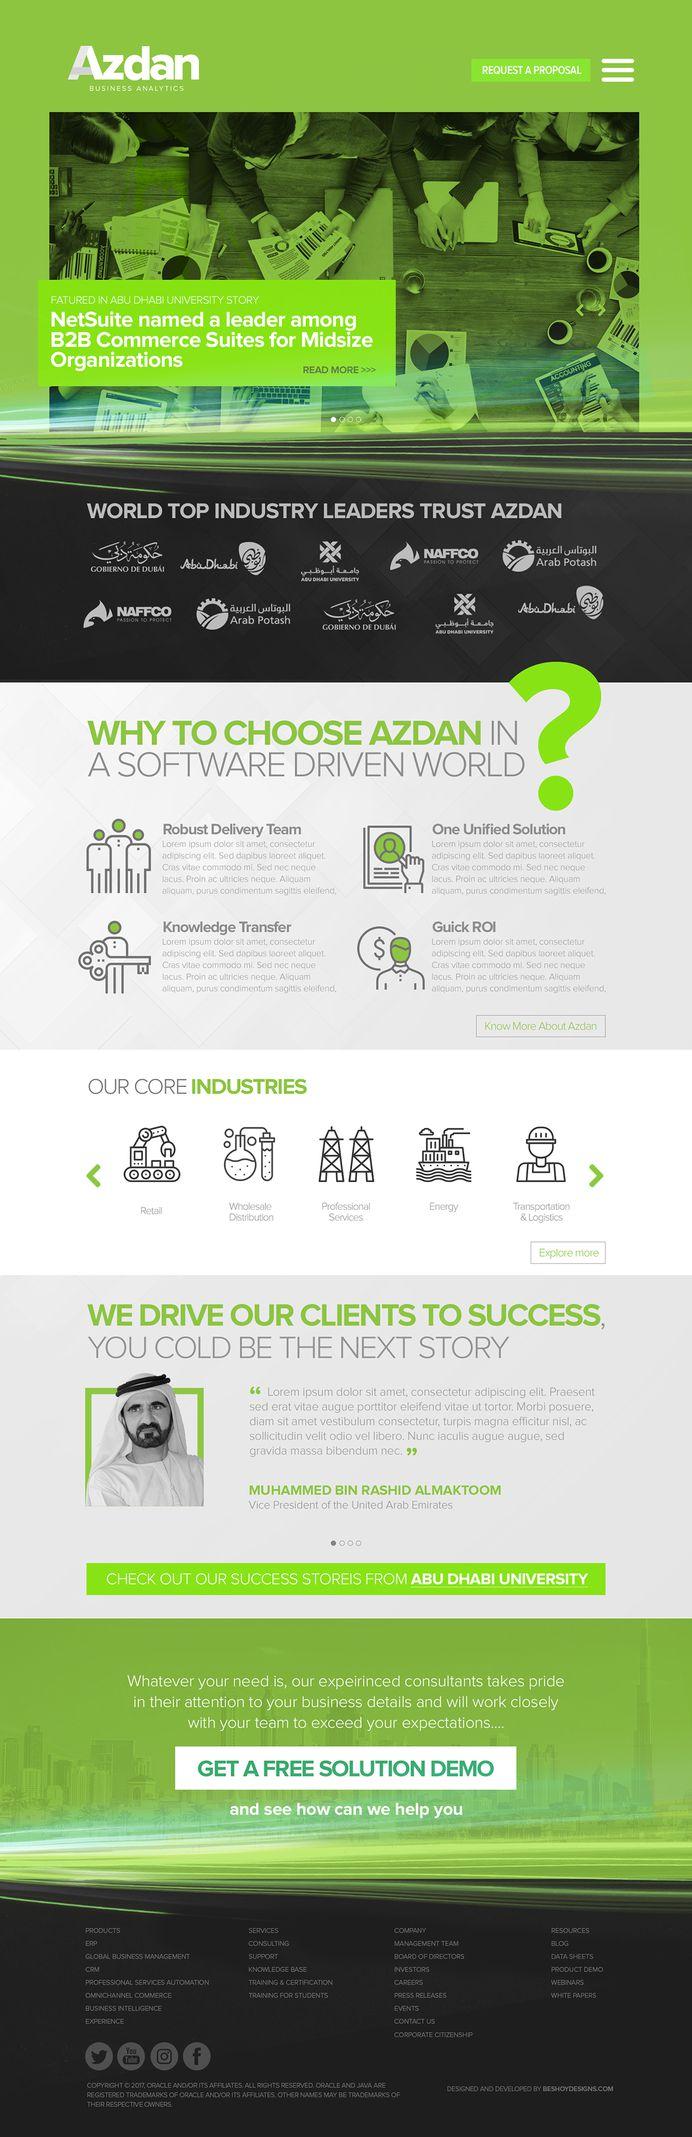 Azdan / Website Design and Development on Behance